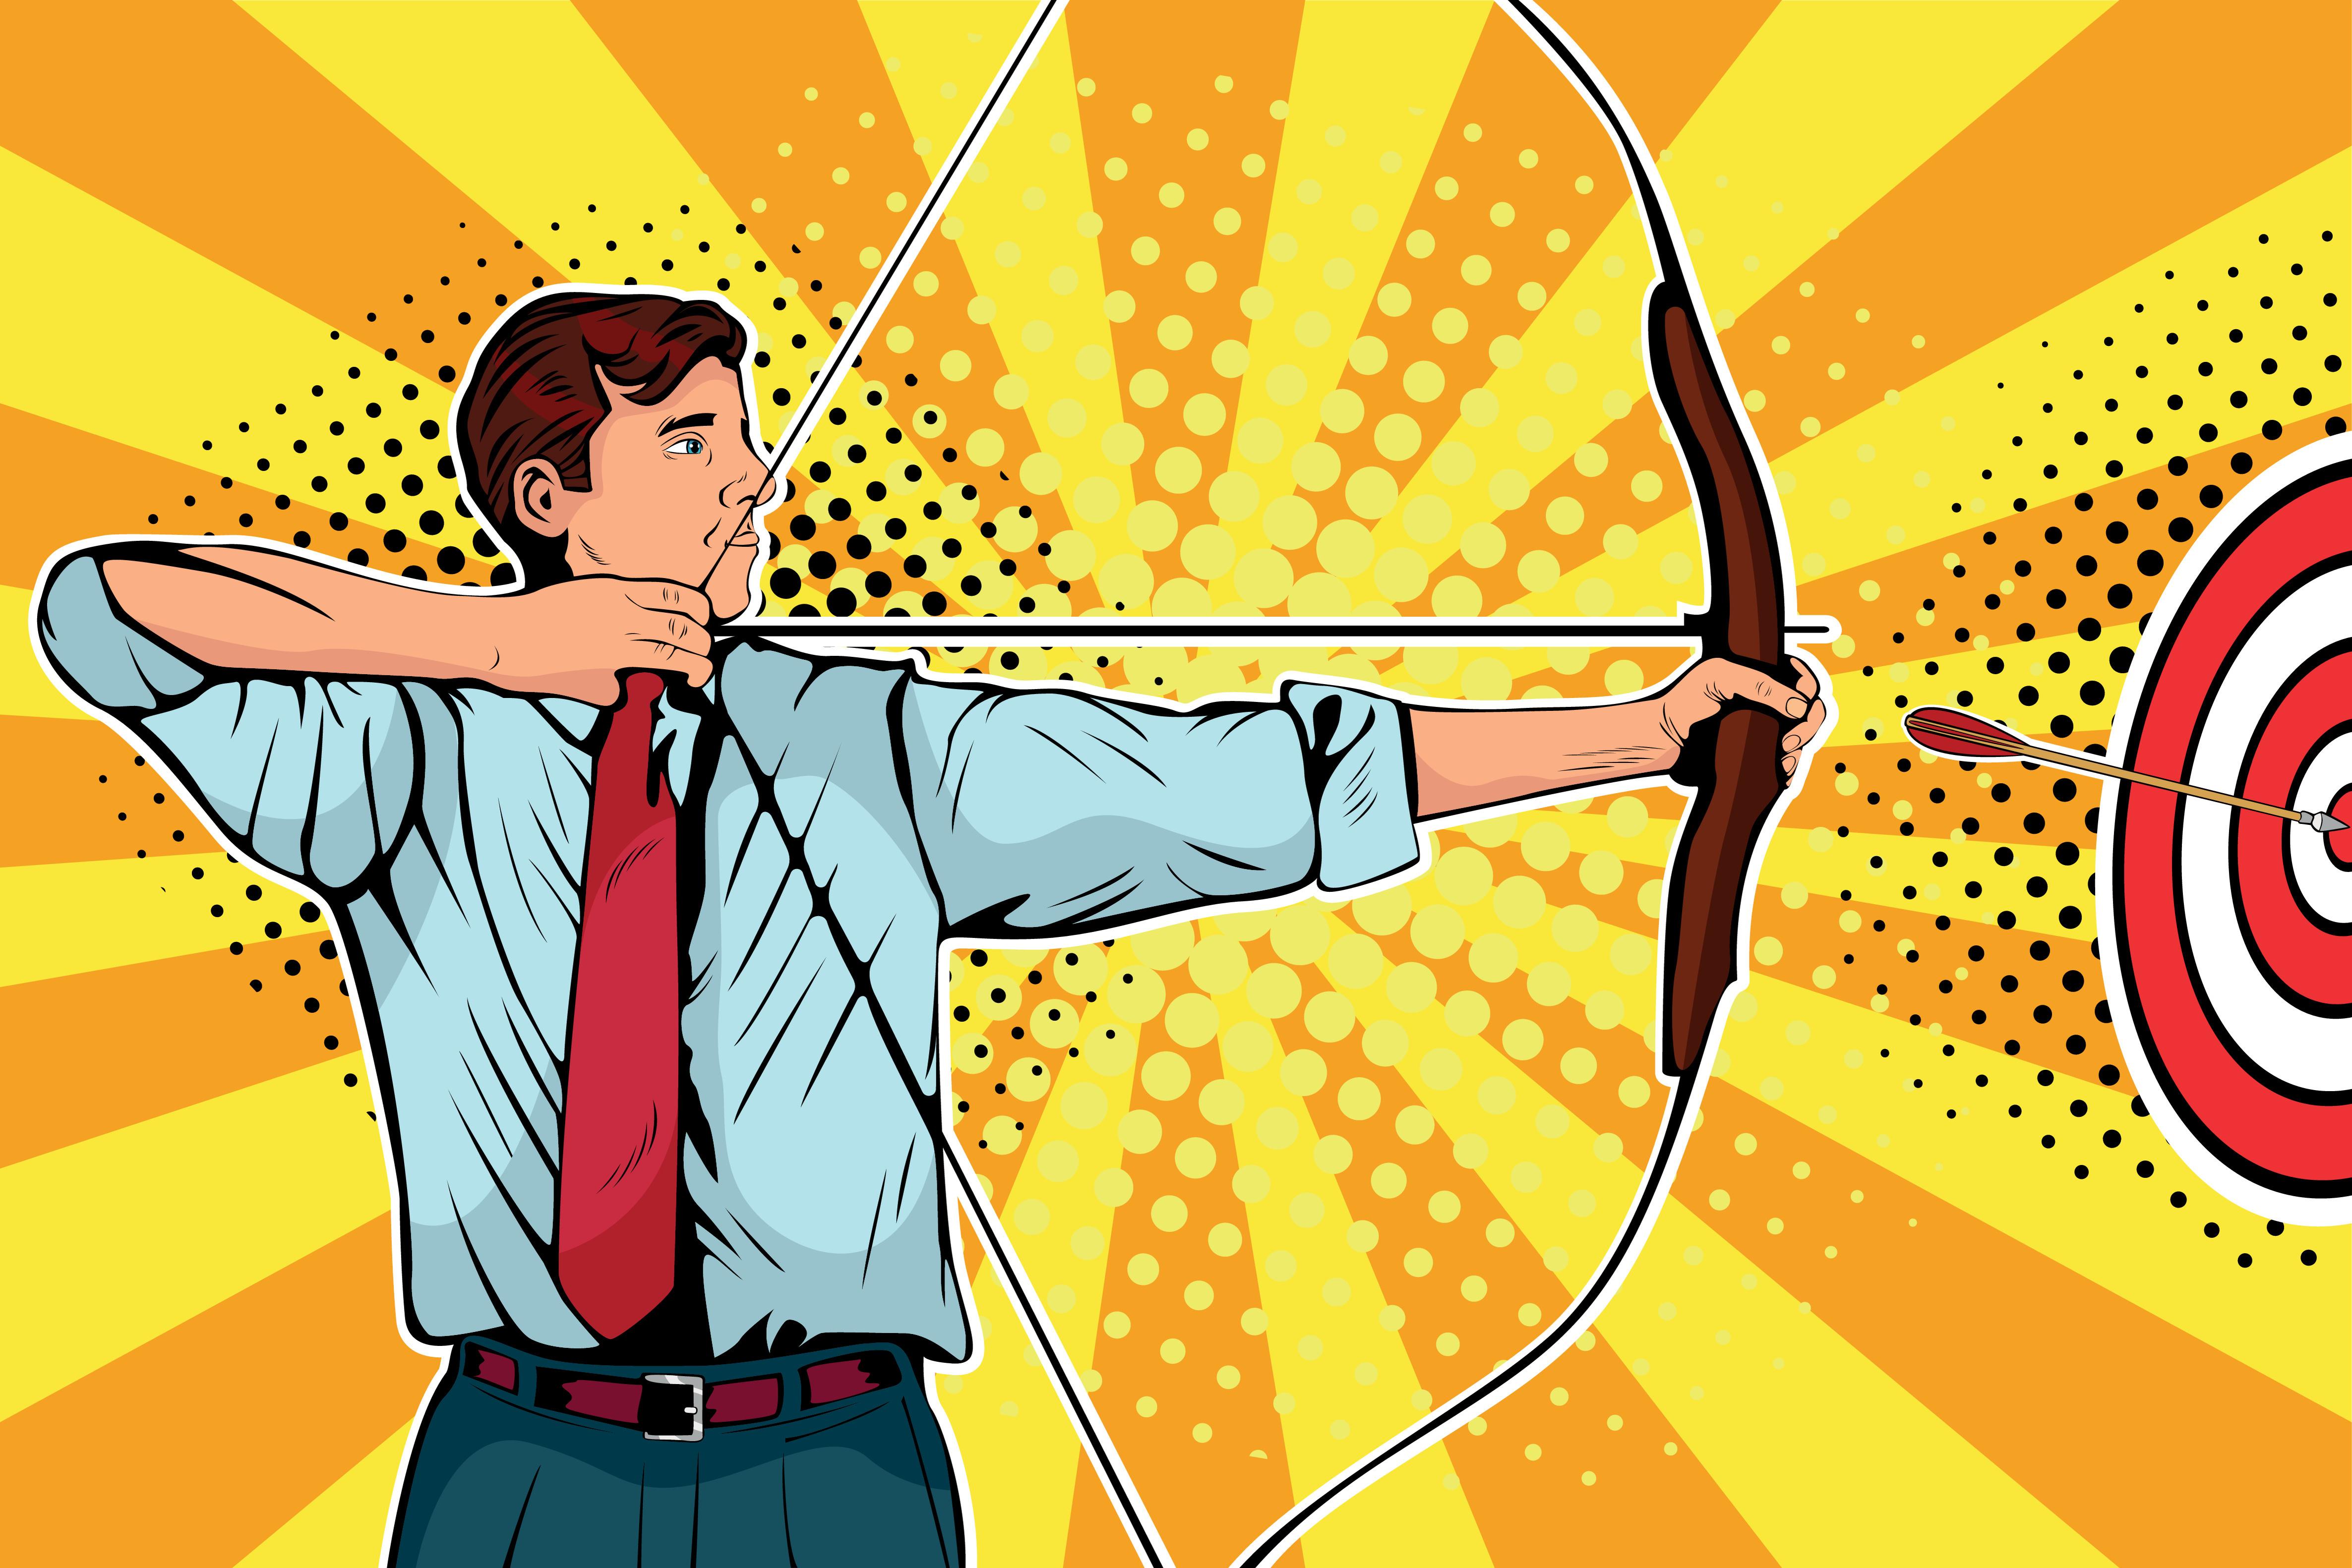 Professional man playing archery